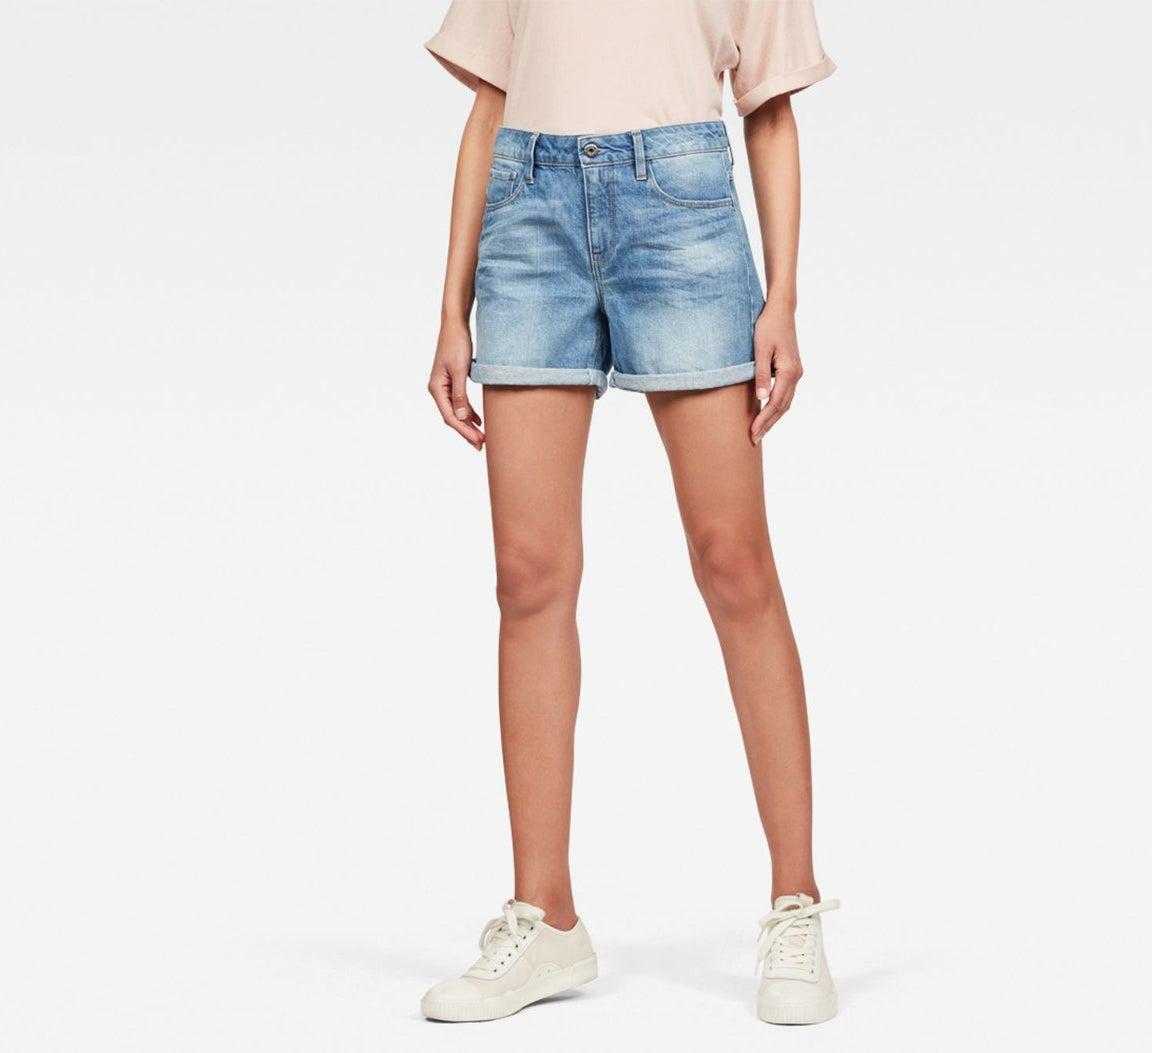 A model in light wash baggy denim shorts